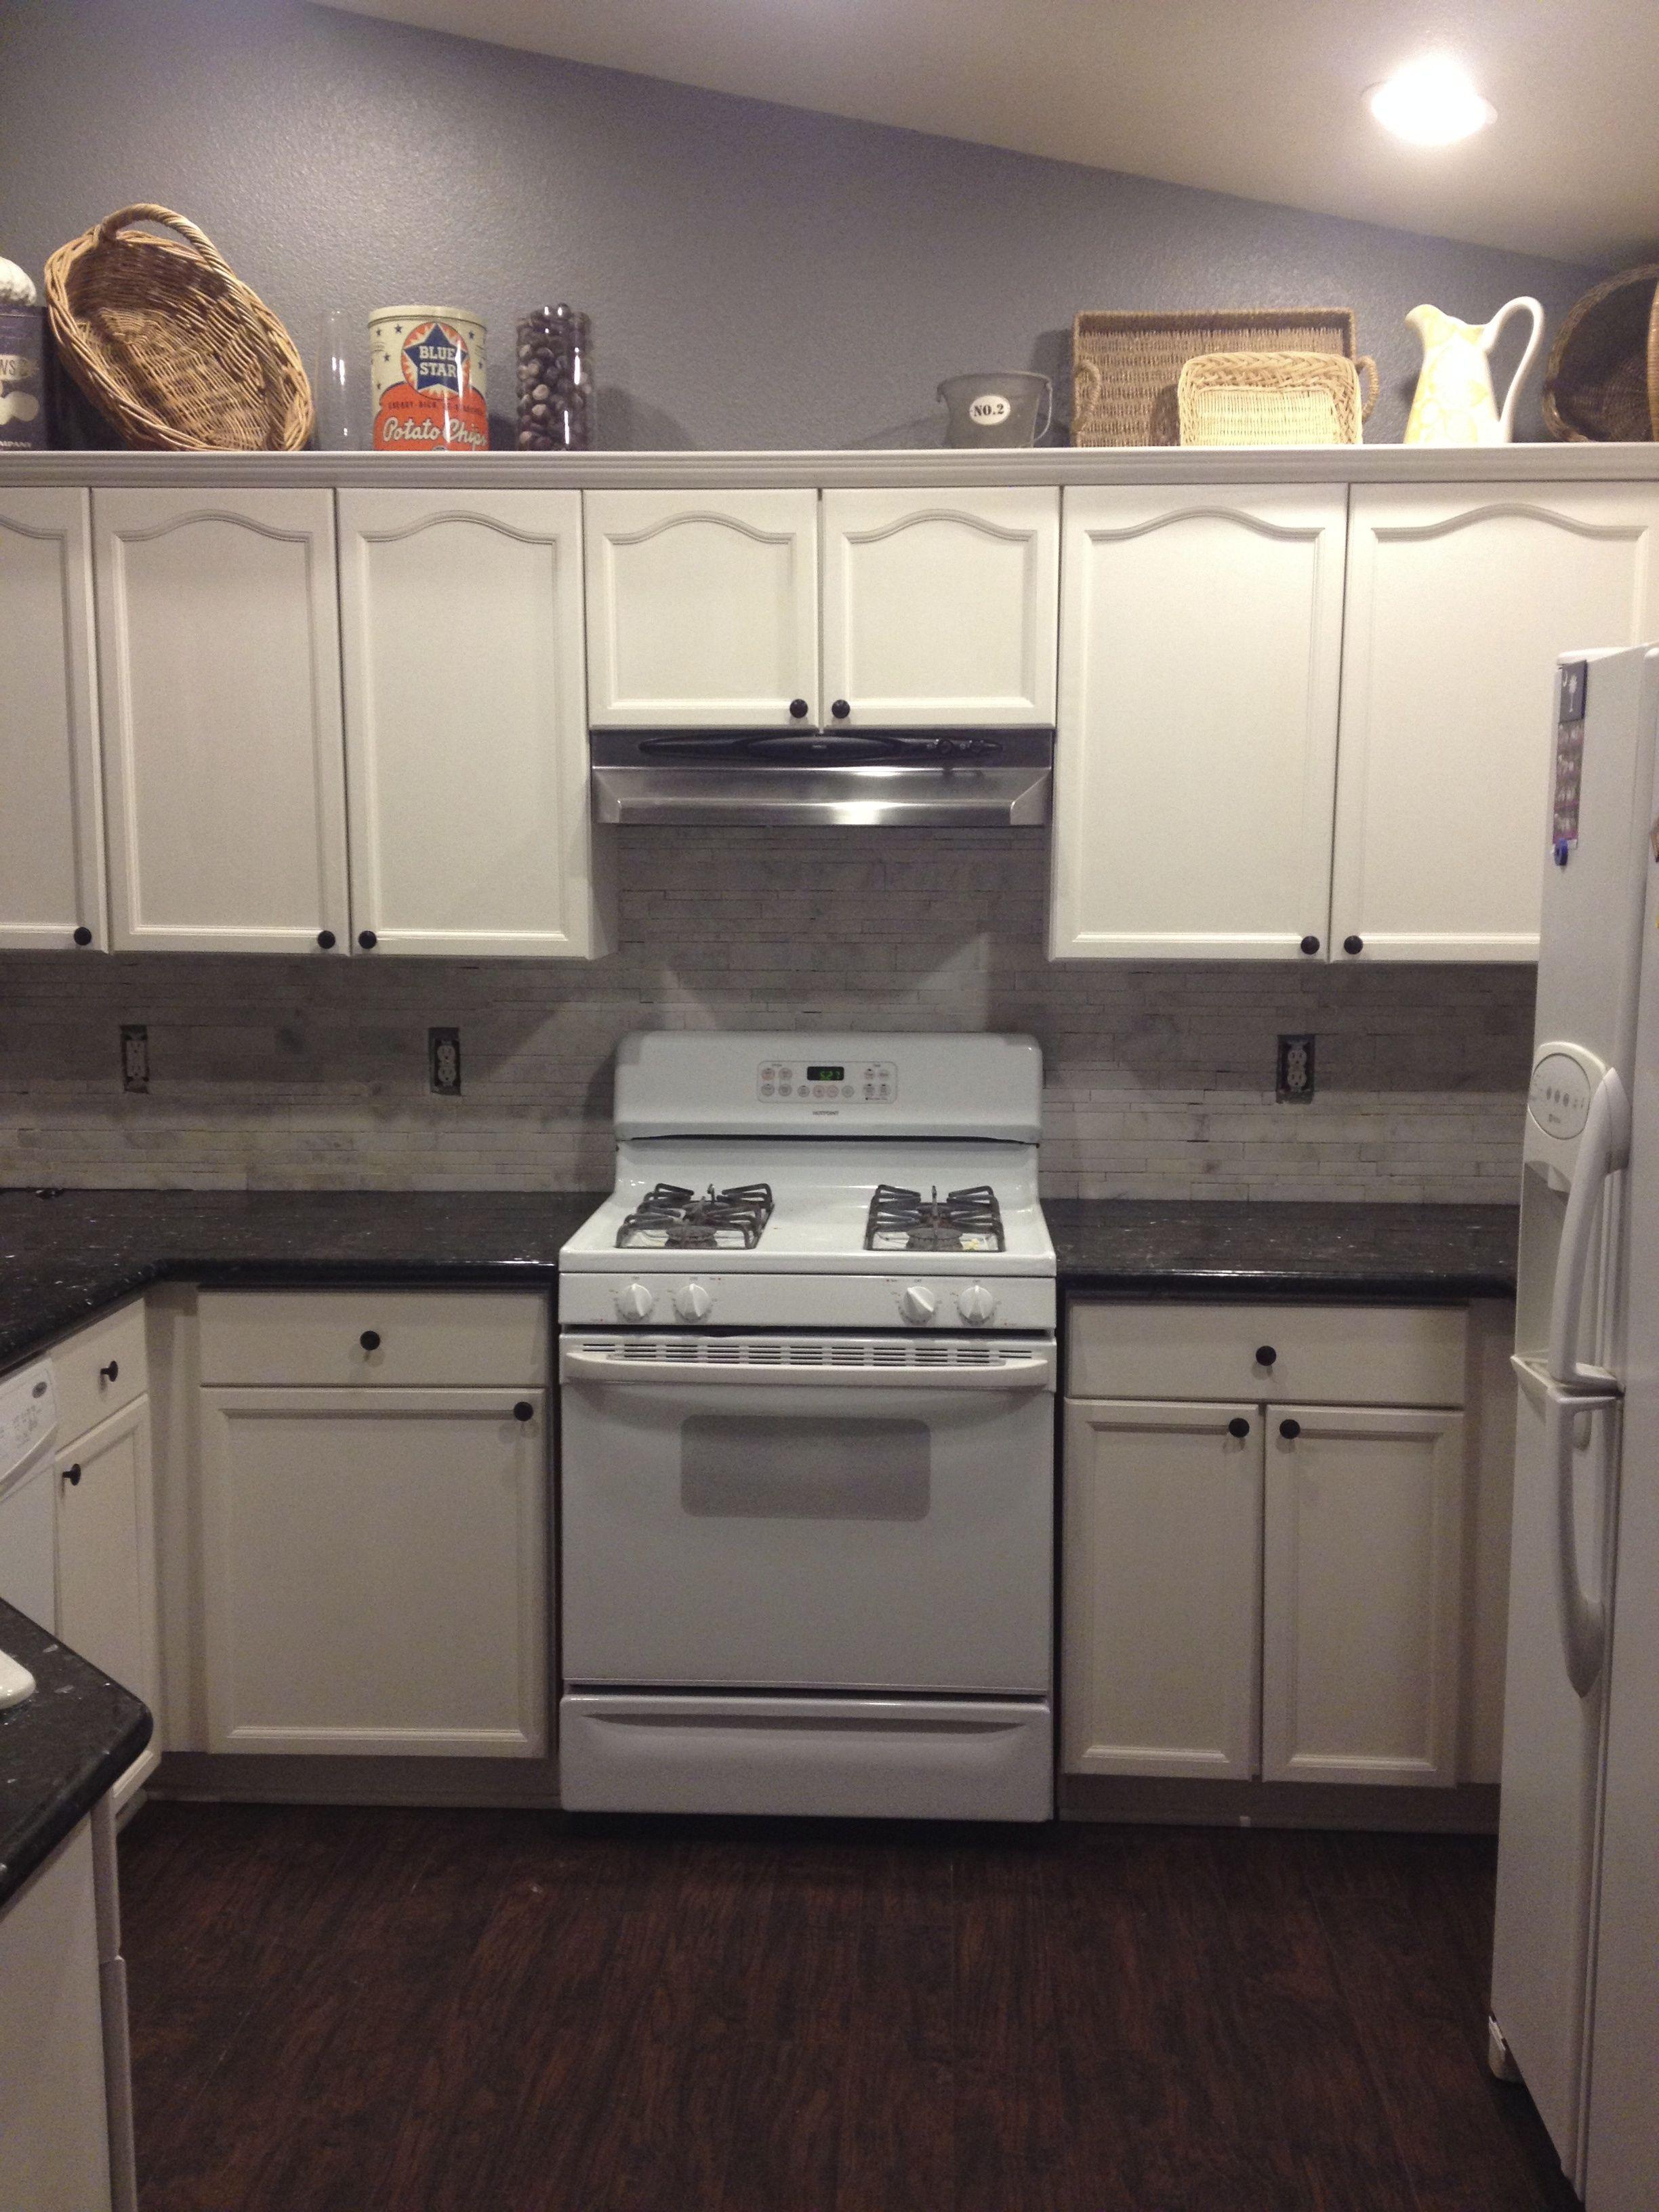 Got The New Emerald Pearl Granite Countertops Installed, Dark Hardwood  Floor, White Cabinets,